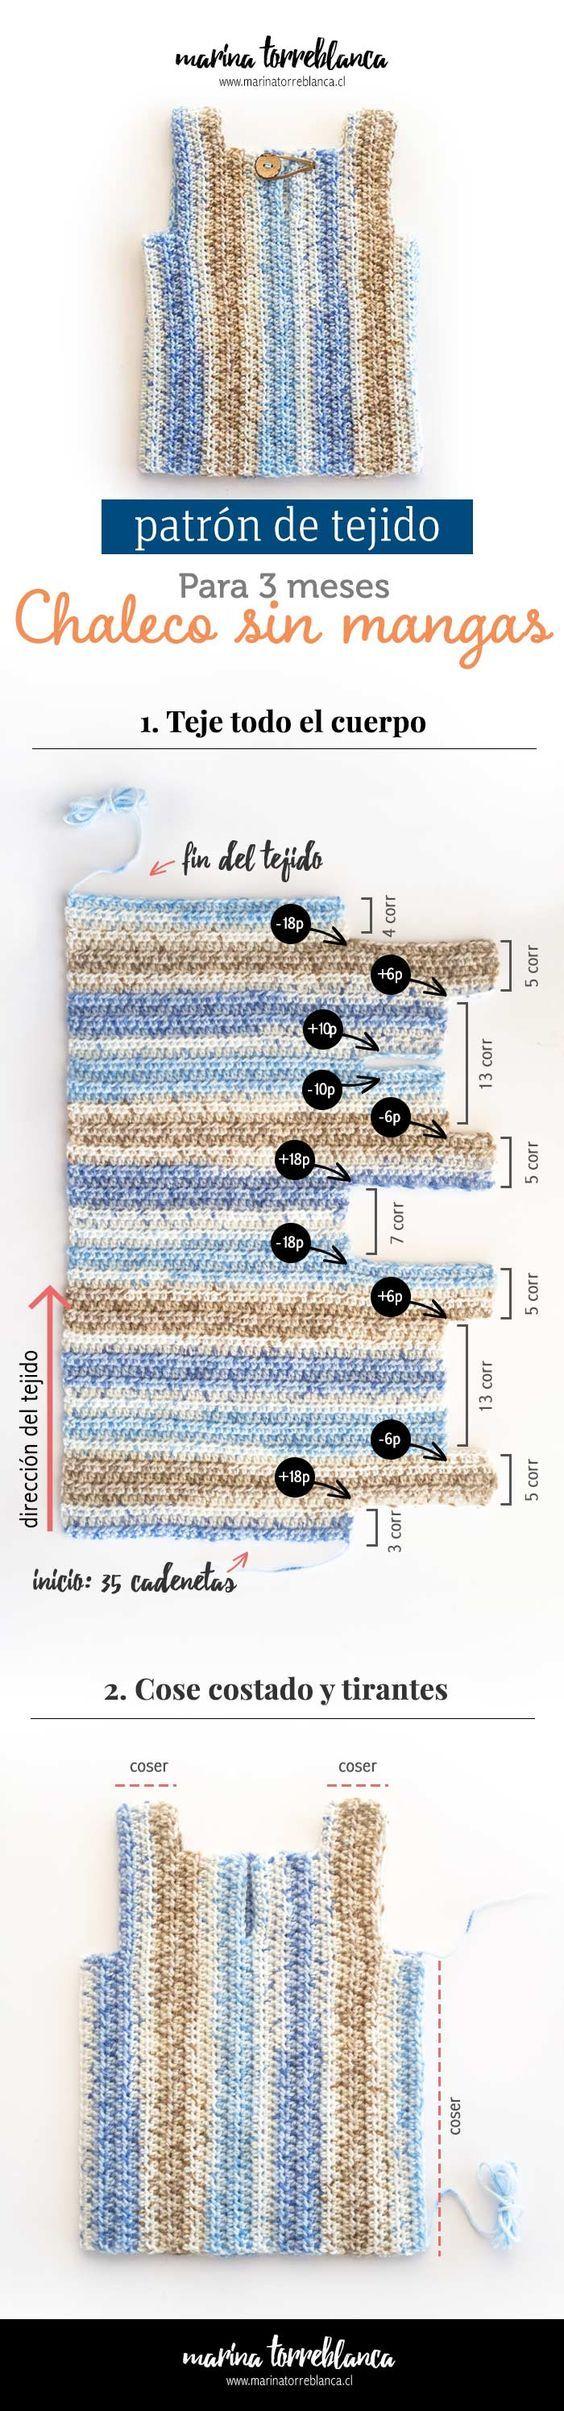 Chaleco sin mangas a crochet para 3 meses [Patron de tejido] - Marina Torreblanca Blog